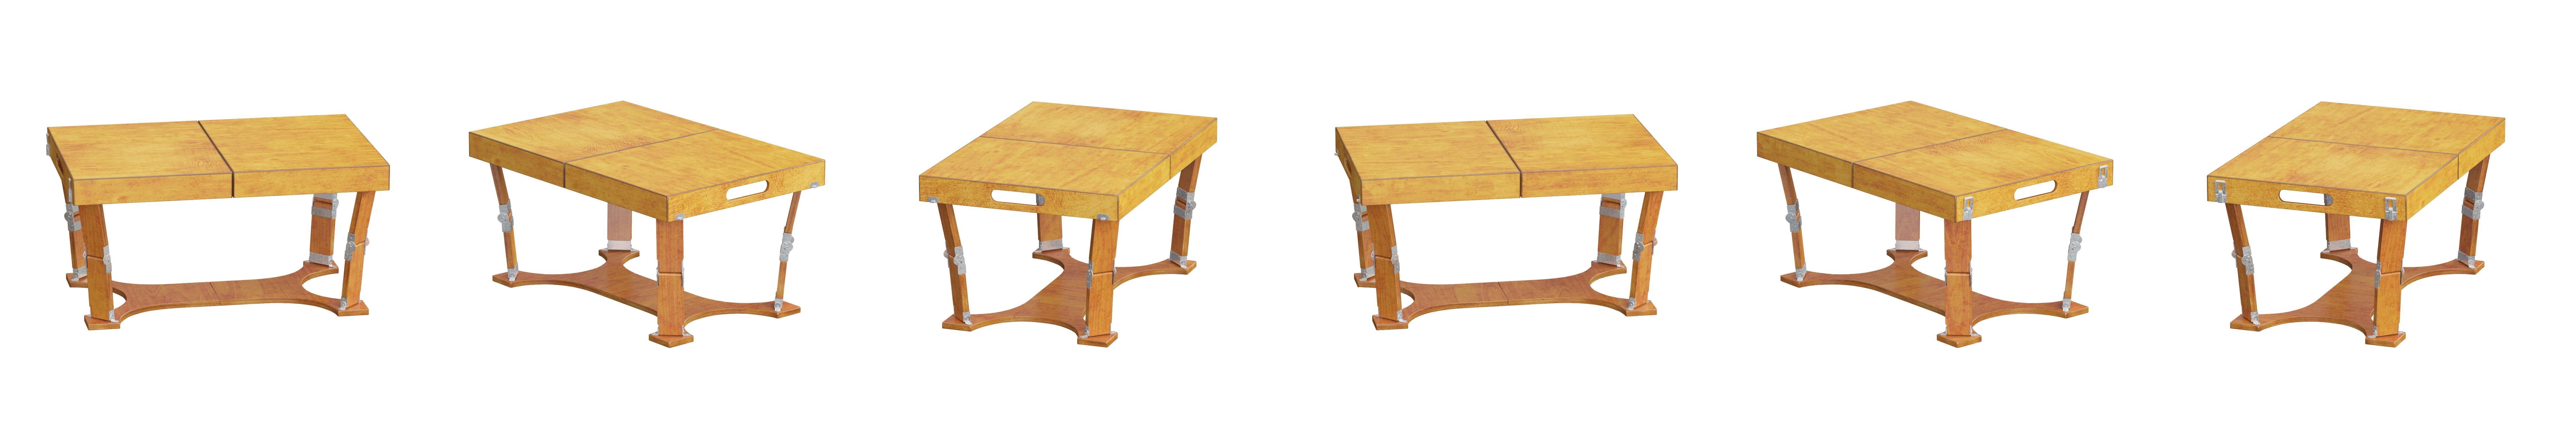 Amazon Com Spiderlegs Folding Coffee Table 28 Inch Warm Oak Furniture Decor